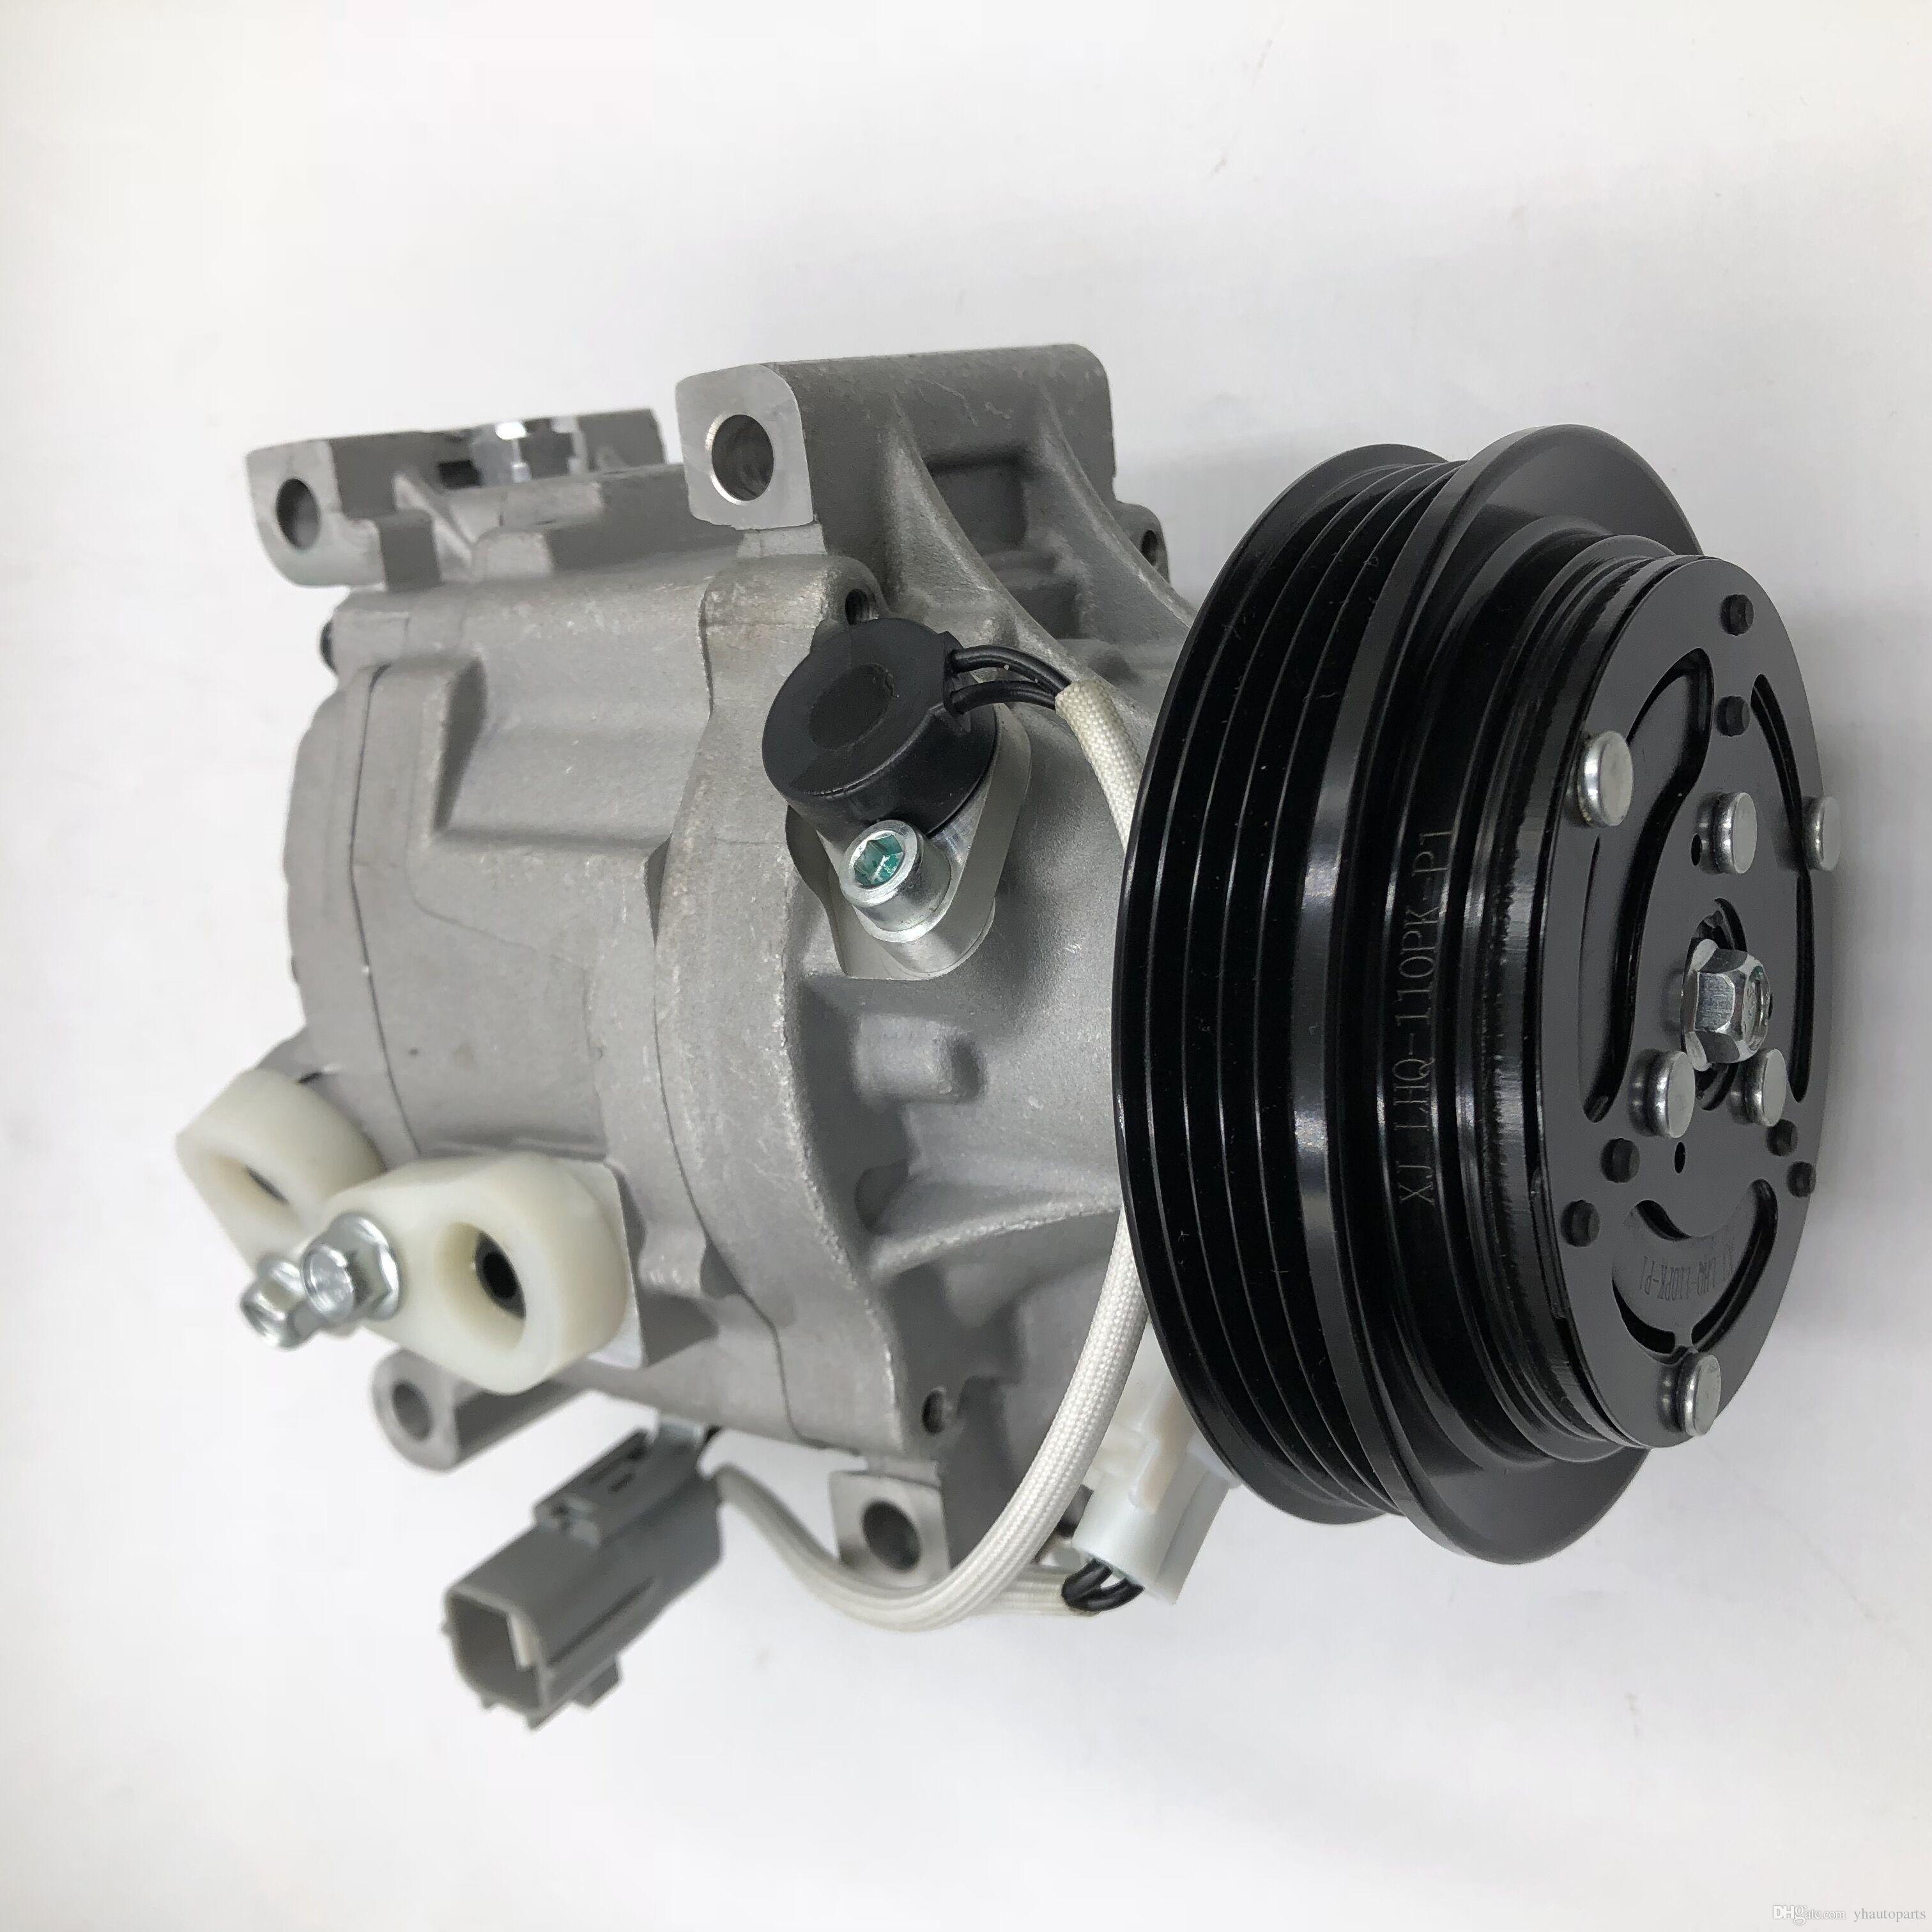 Car Ac Compressor >> Car Ac Compressor For Toyota Corolla 06c 4pk 12v W Sensor Wxh 066 X2 Quality Air Compressors Quiet Air Compressor From Yhautoparts 95 48 Dhgate Com